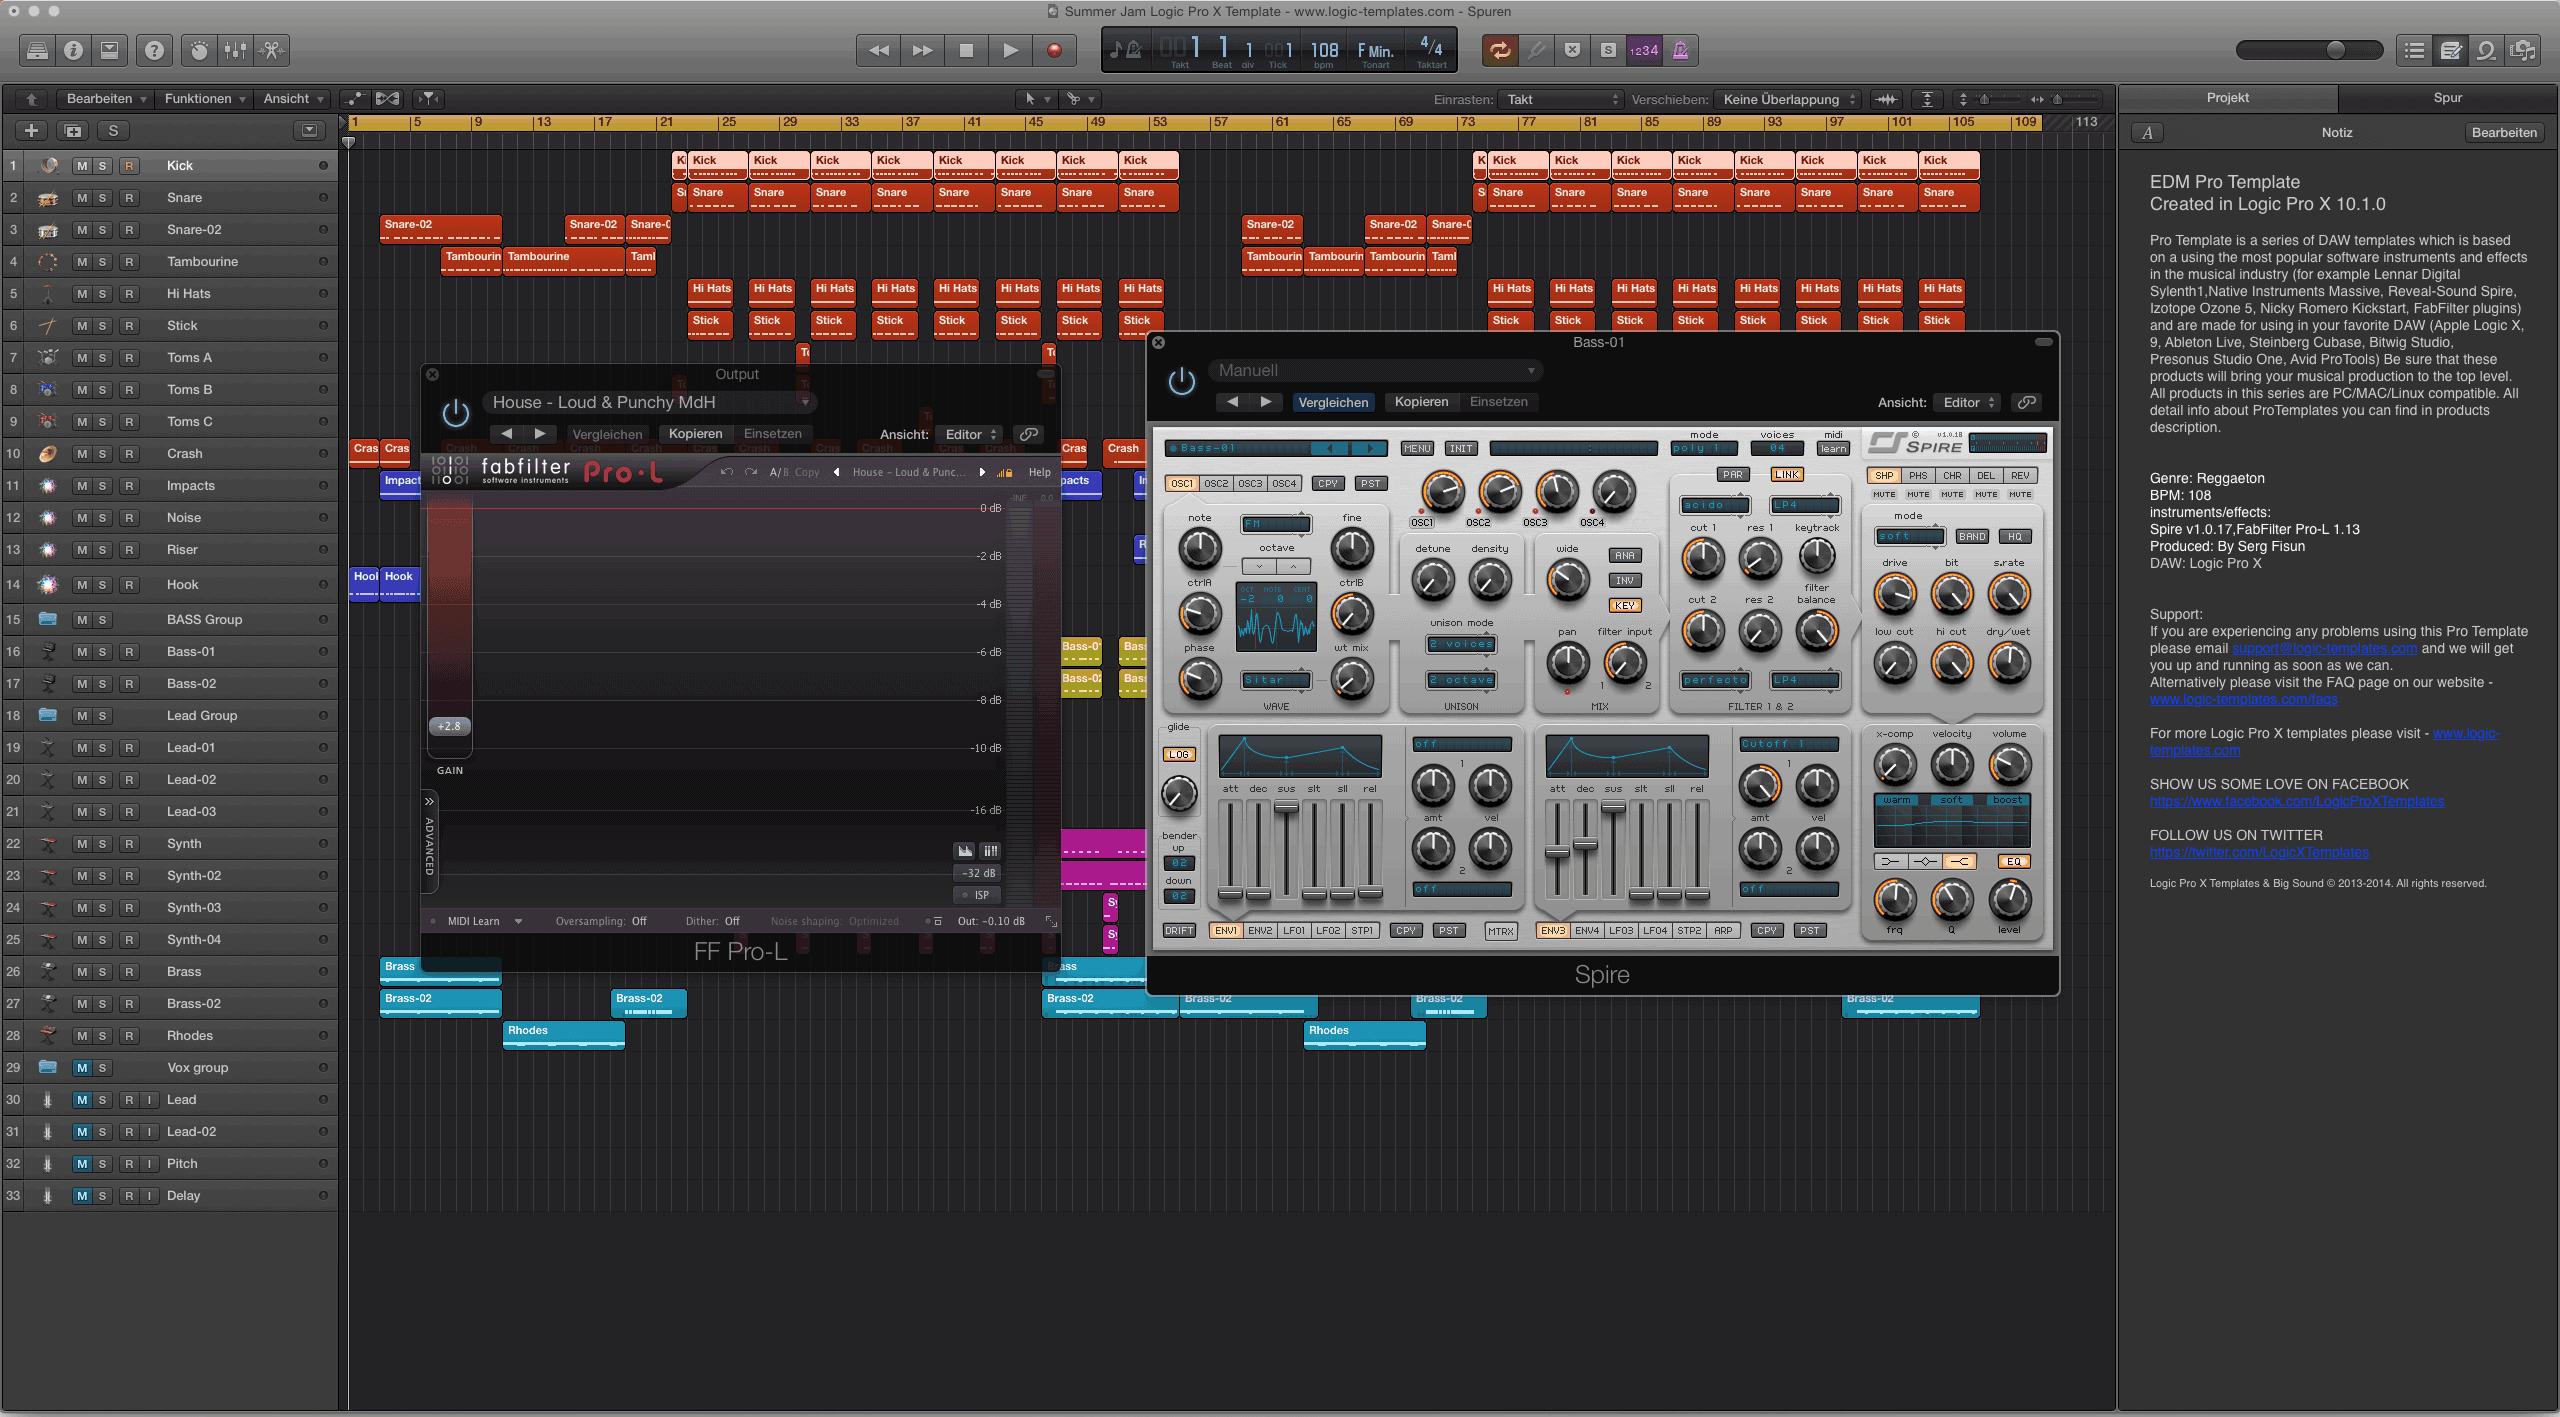 Summer Jam Logic Pro X Template 2